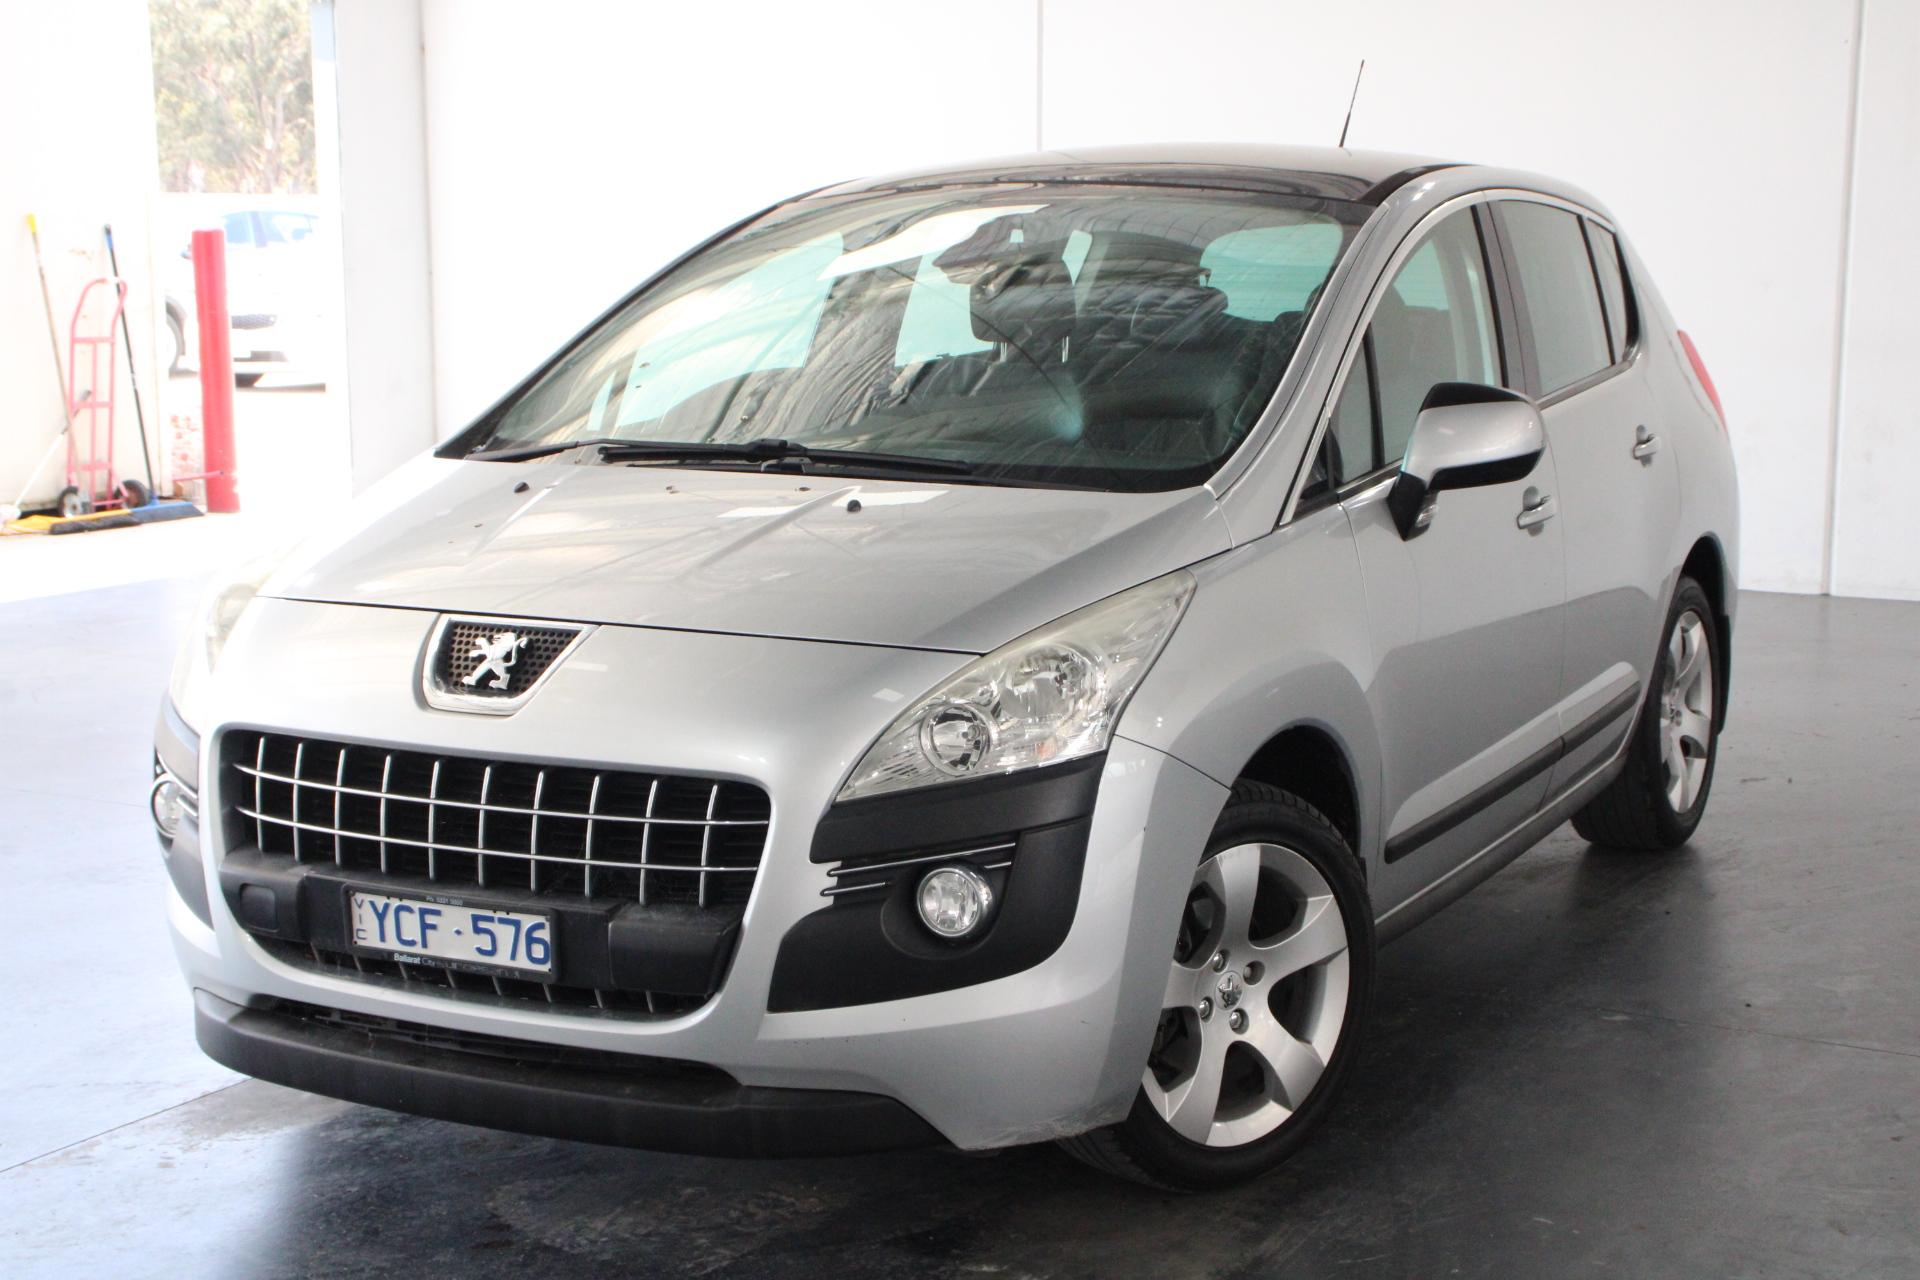 2010 Peugeot 3008 XSE 1.6 HDI Turbo Diesel Auto Hatchback